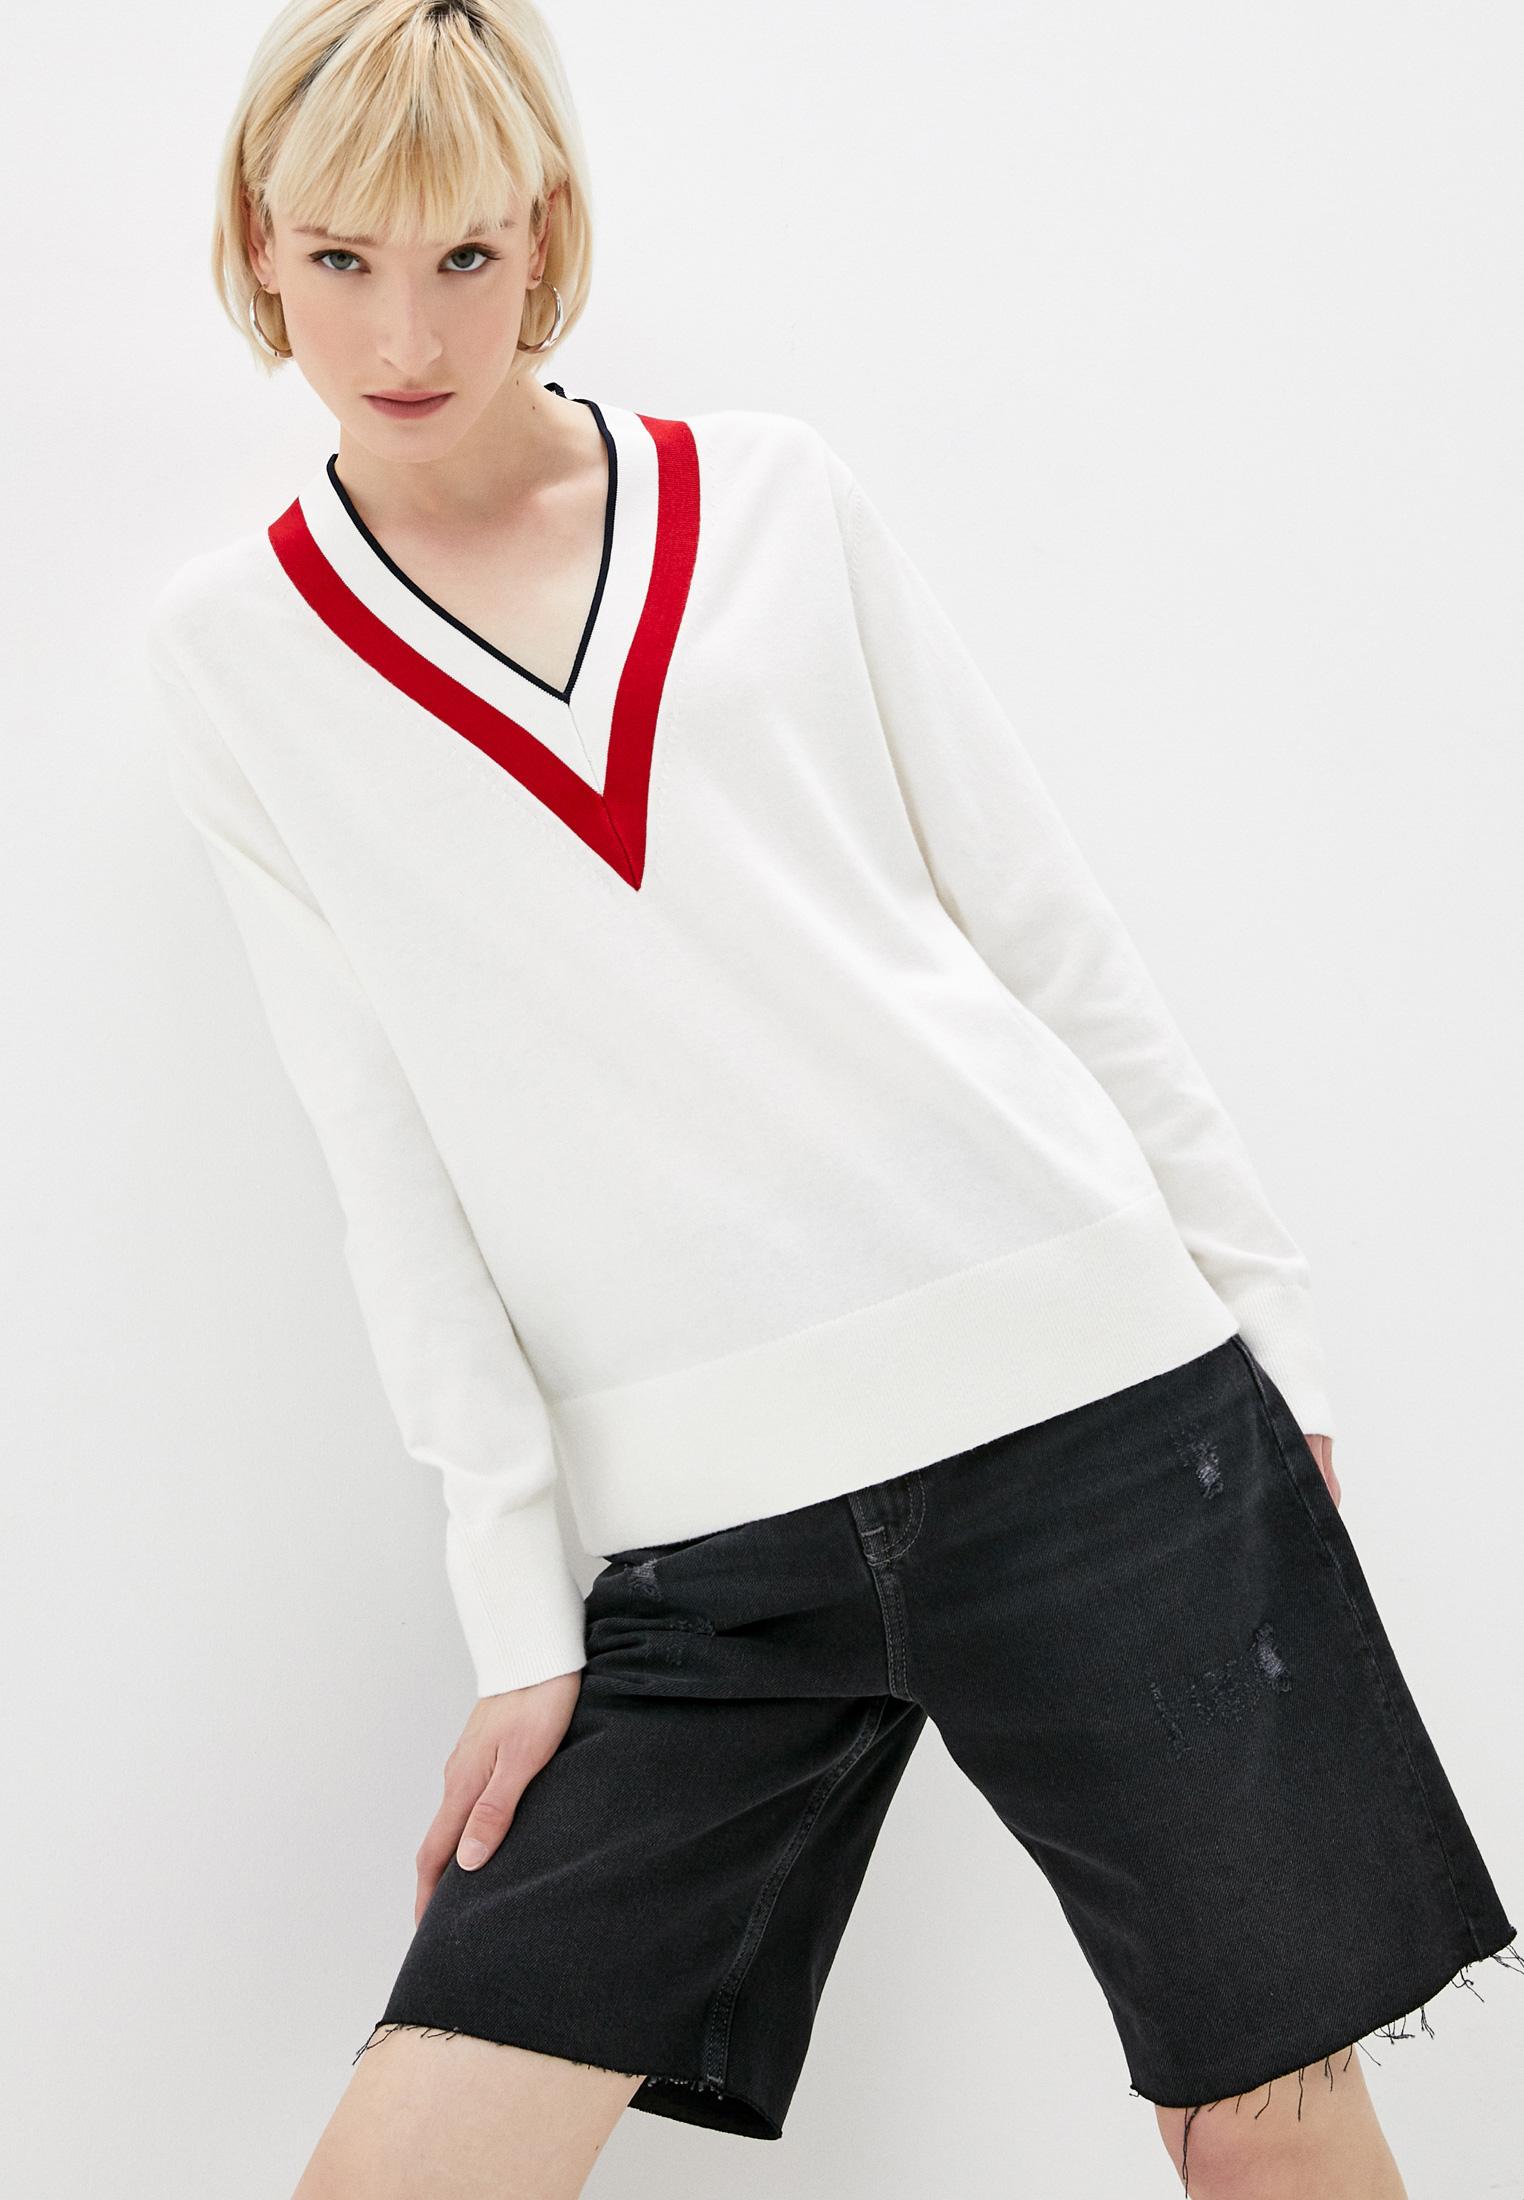 Пуловер Tommy Hilfiger (Томми Хилфигер) WW0WW29878